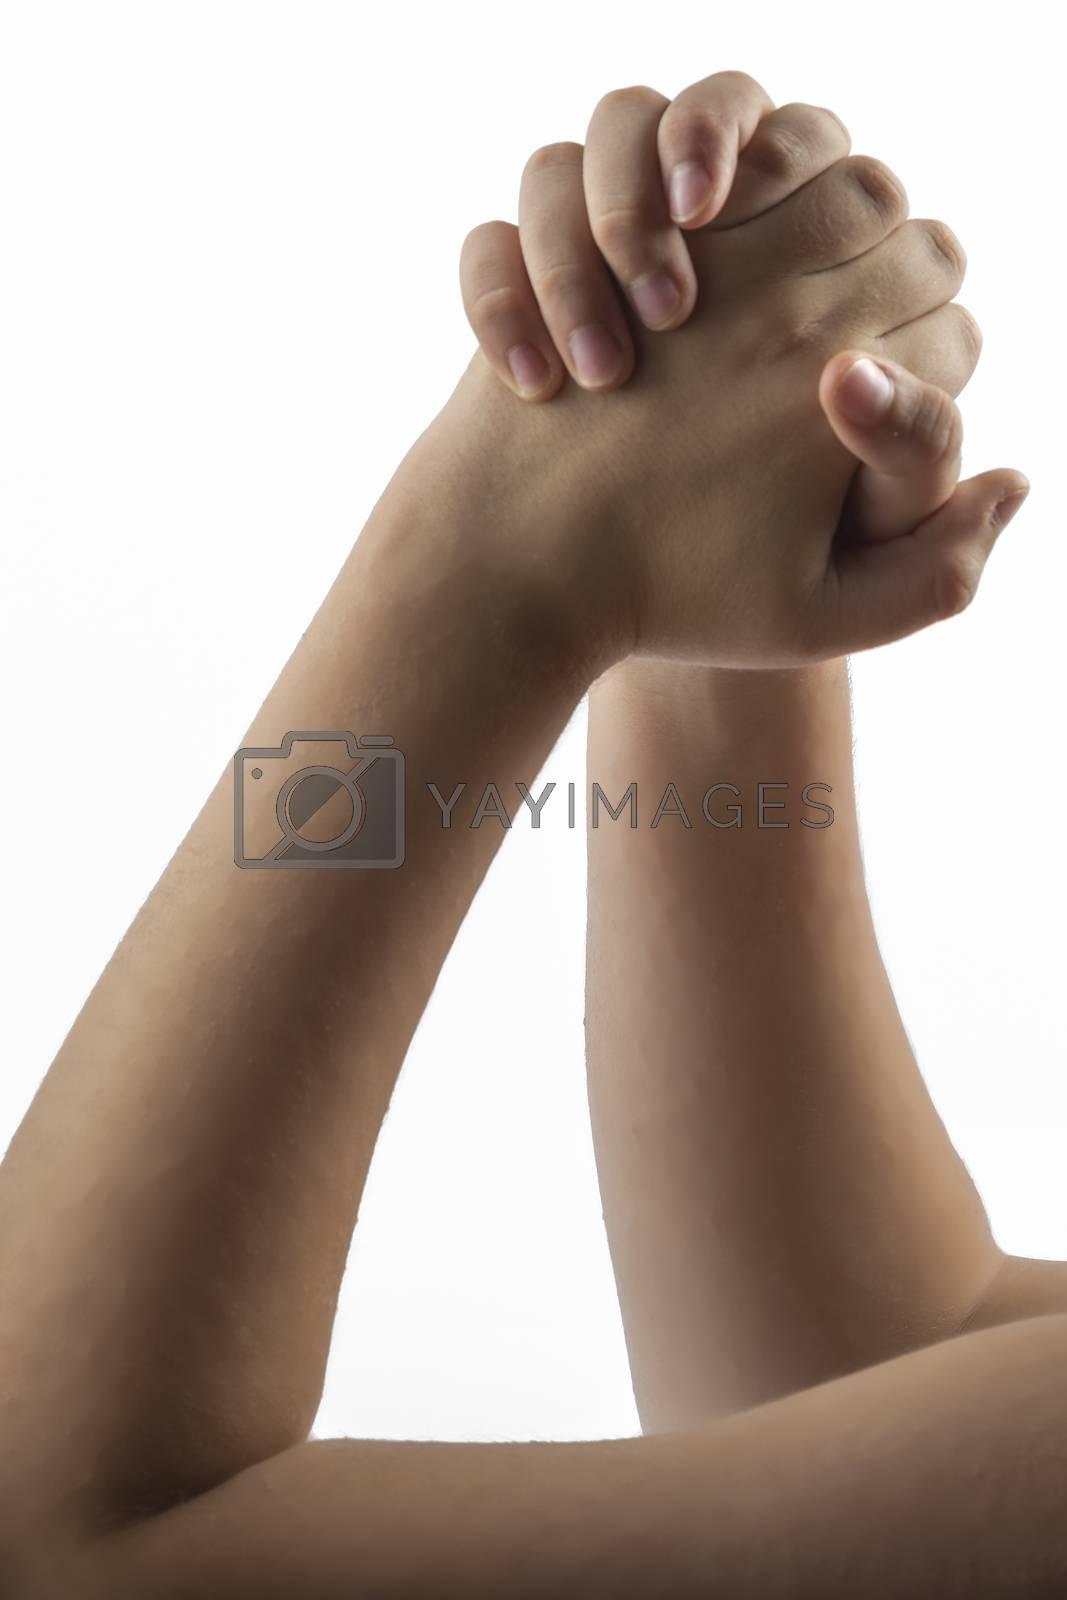 Young hands make a embracing hands  gesture